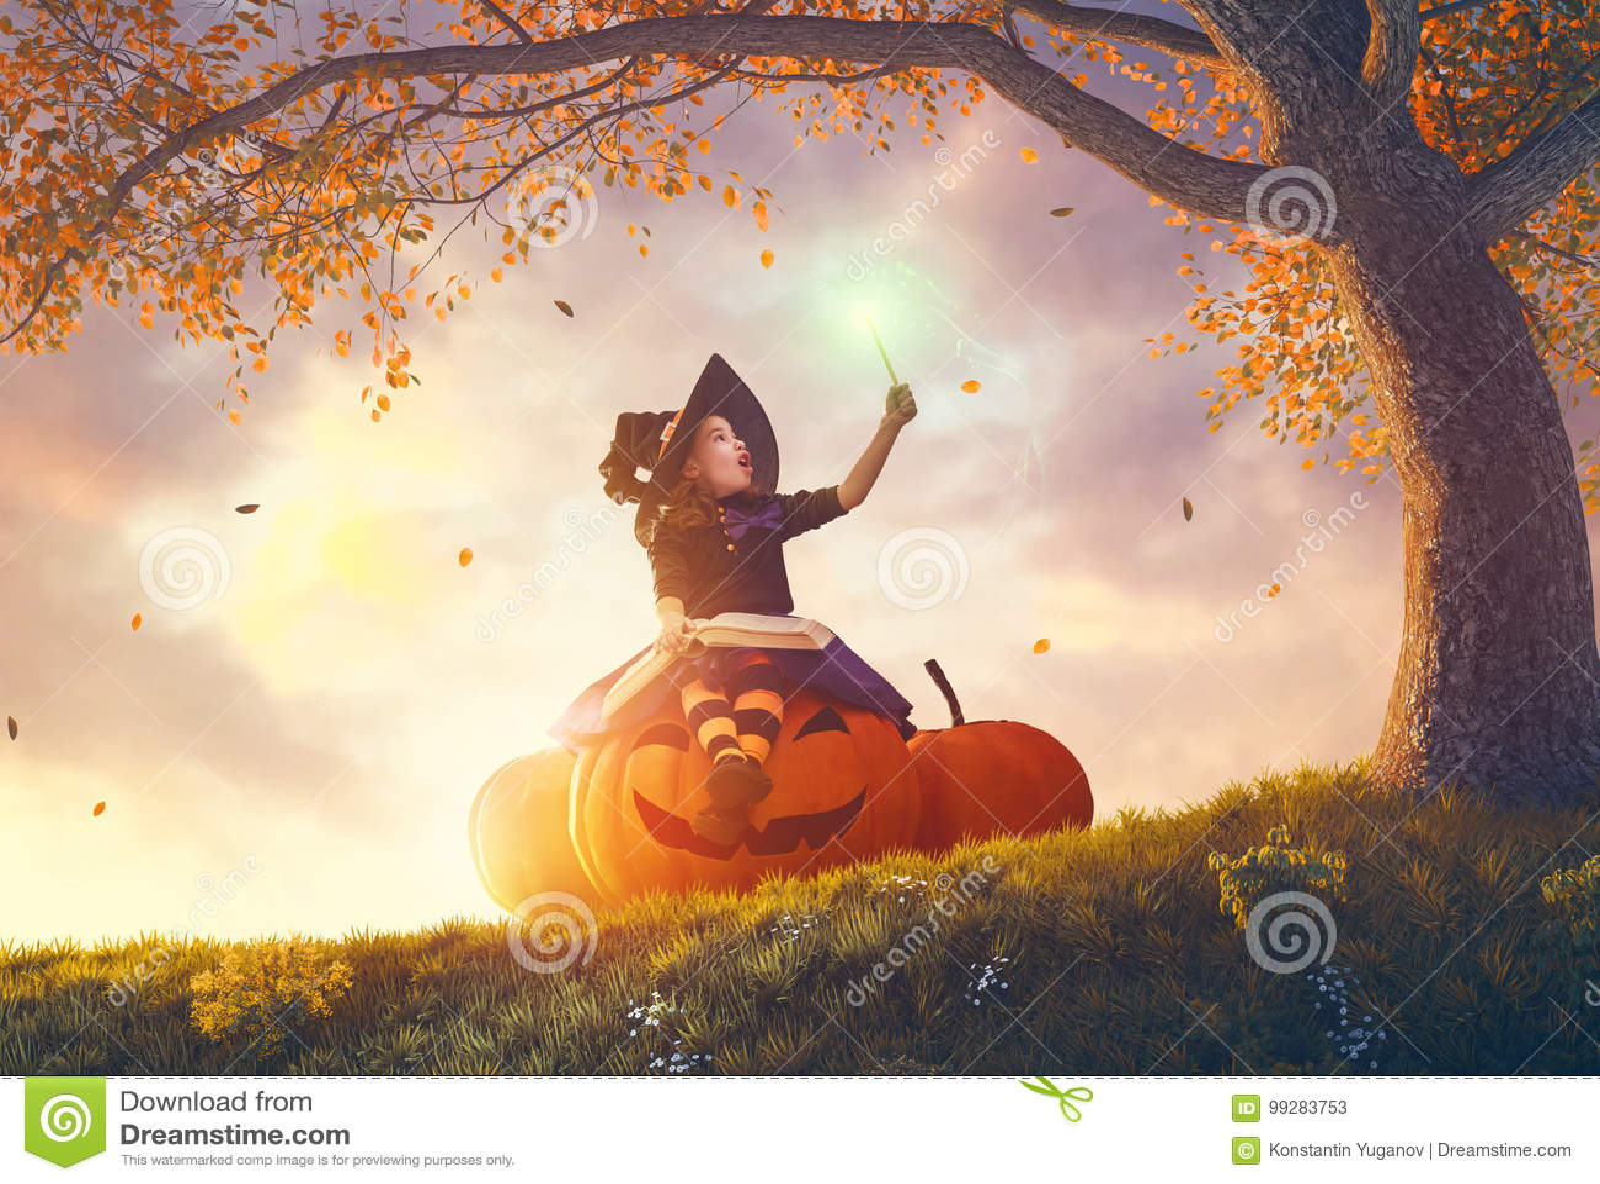 Witch with a big pumpkin